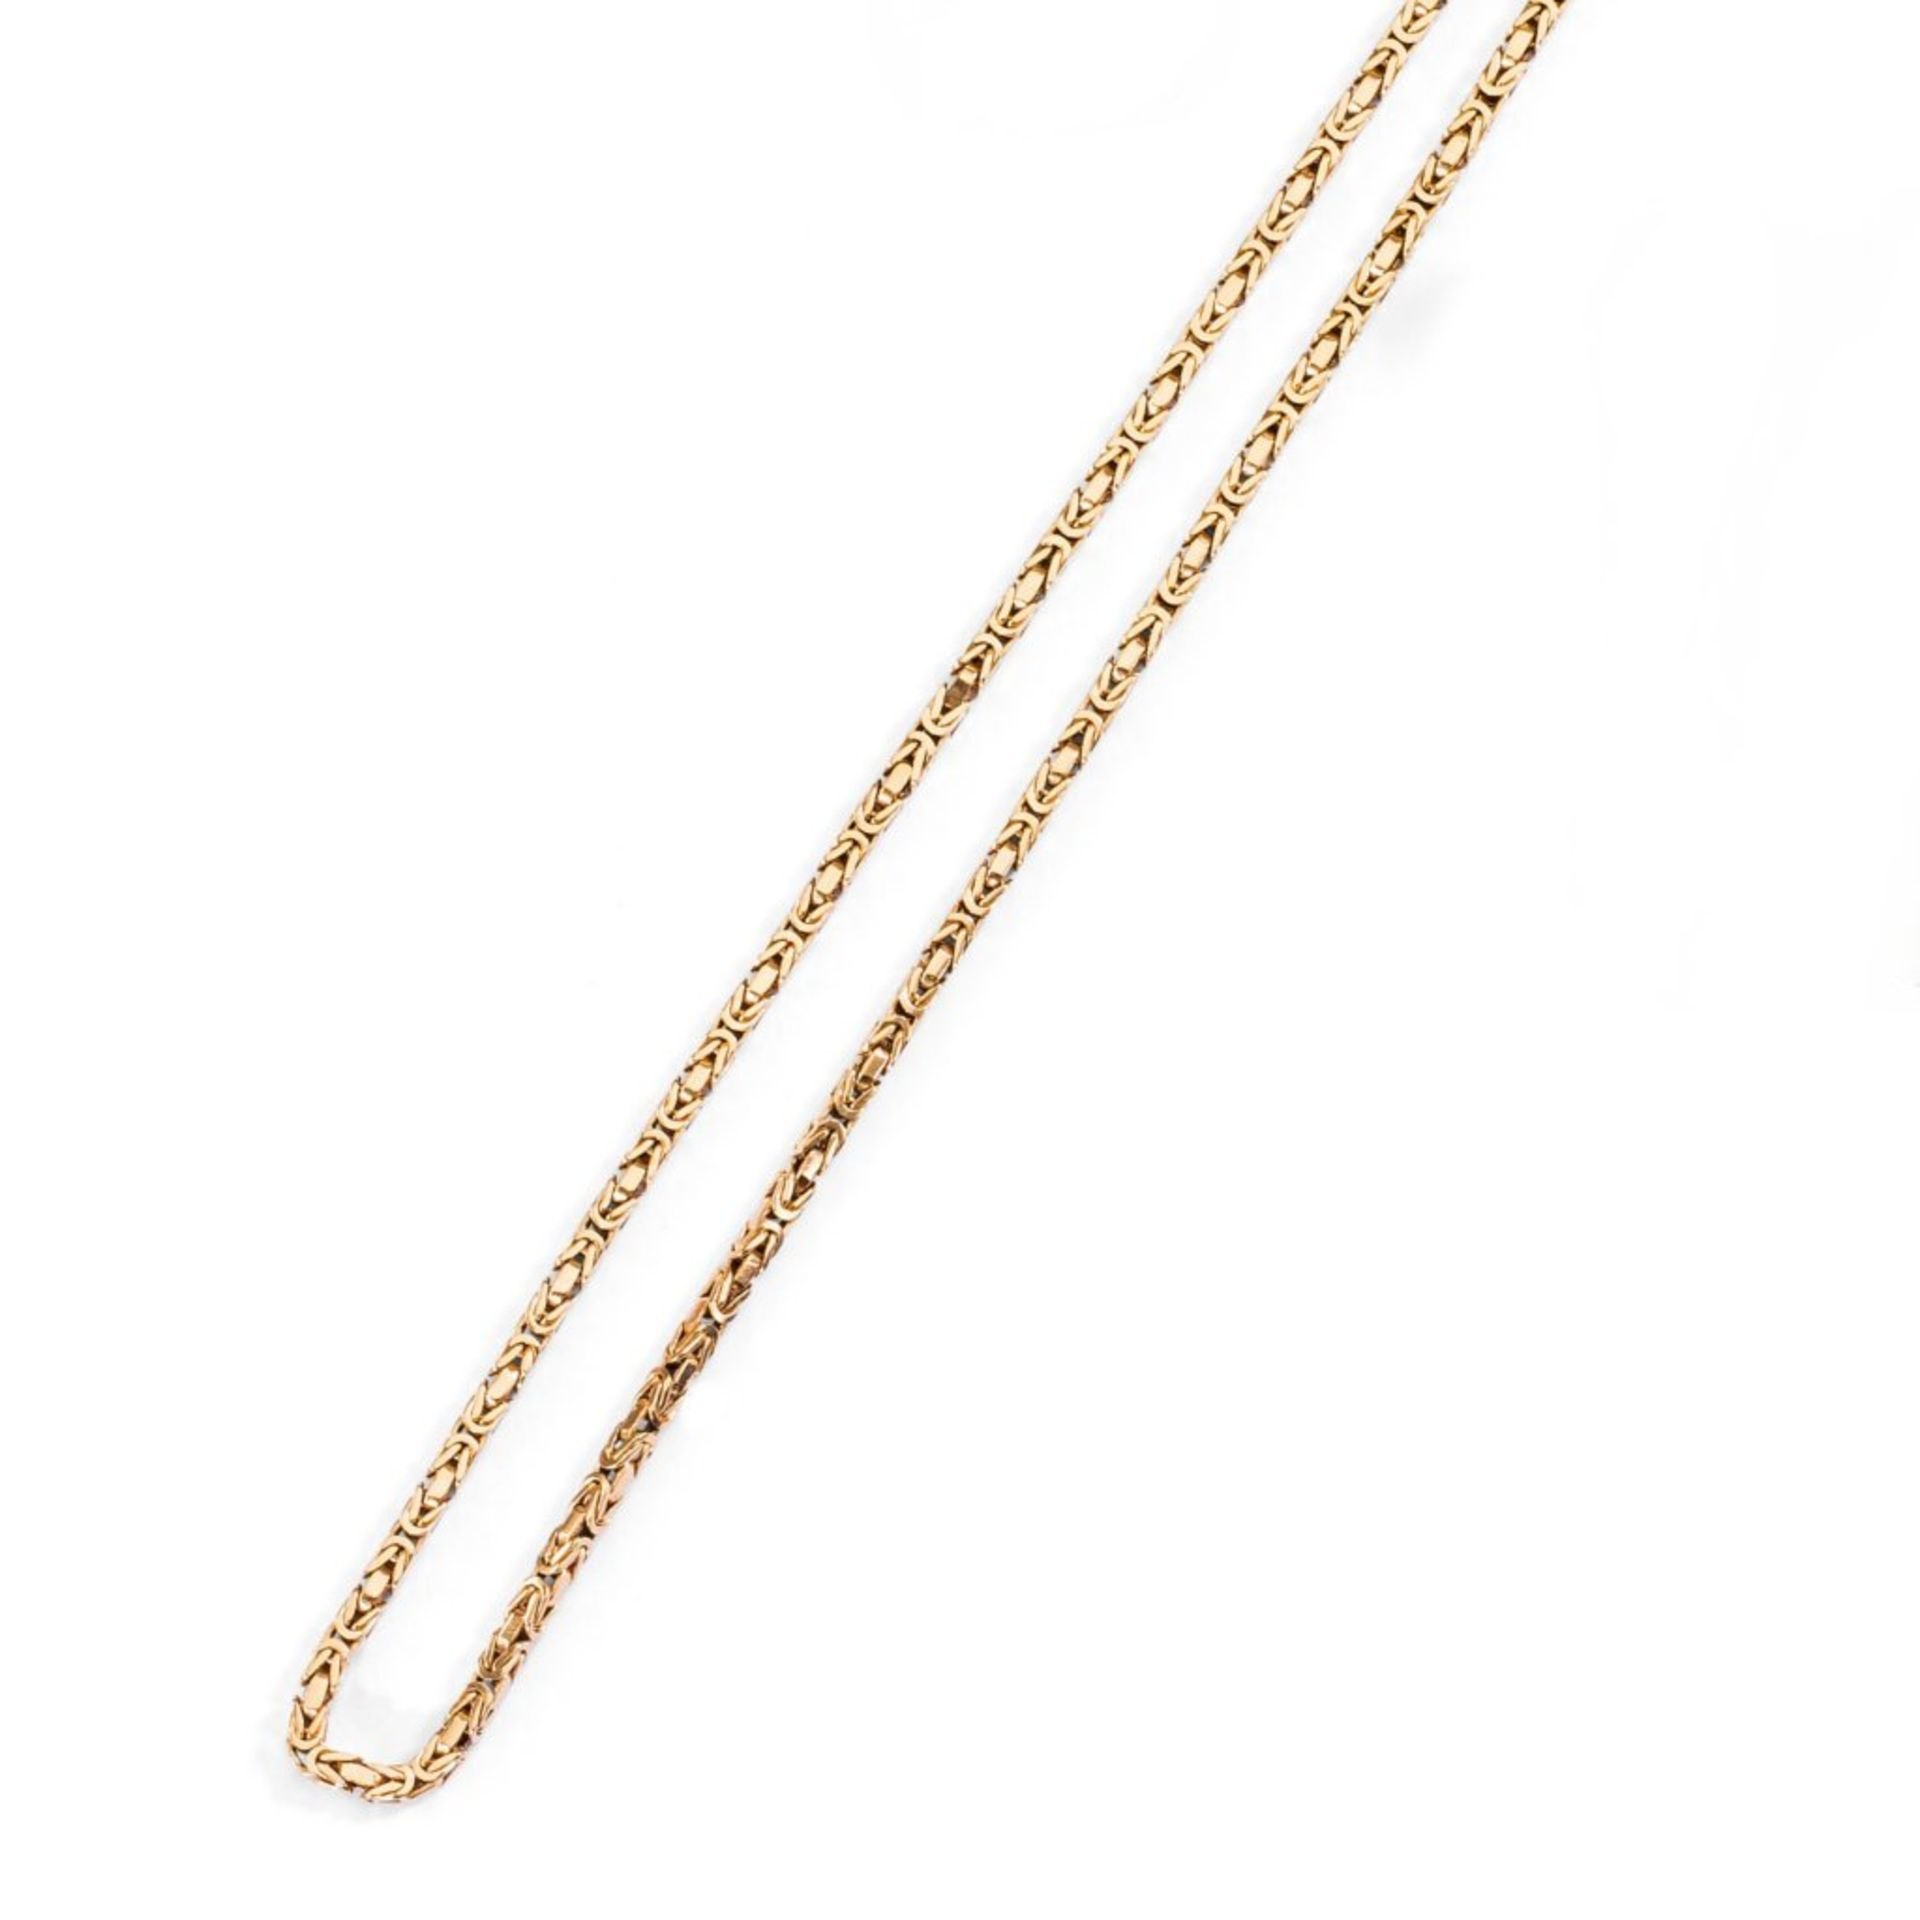 Goldene Königskette. 14 ct. RG, 60 g. L 84 cm